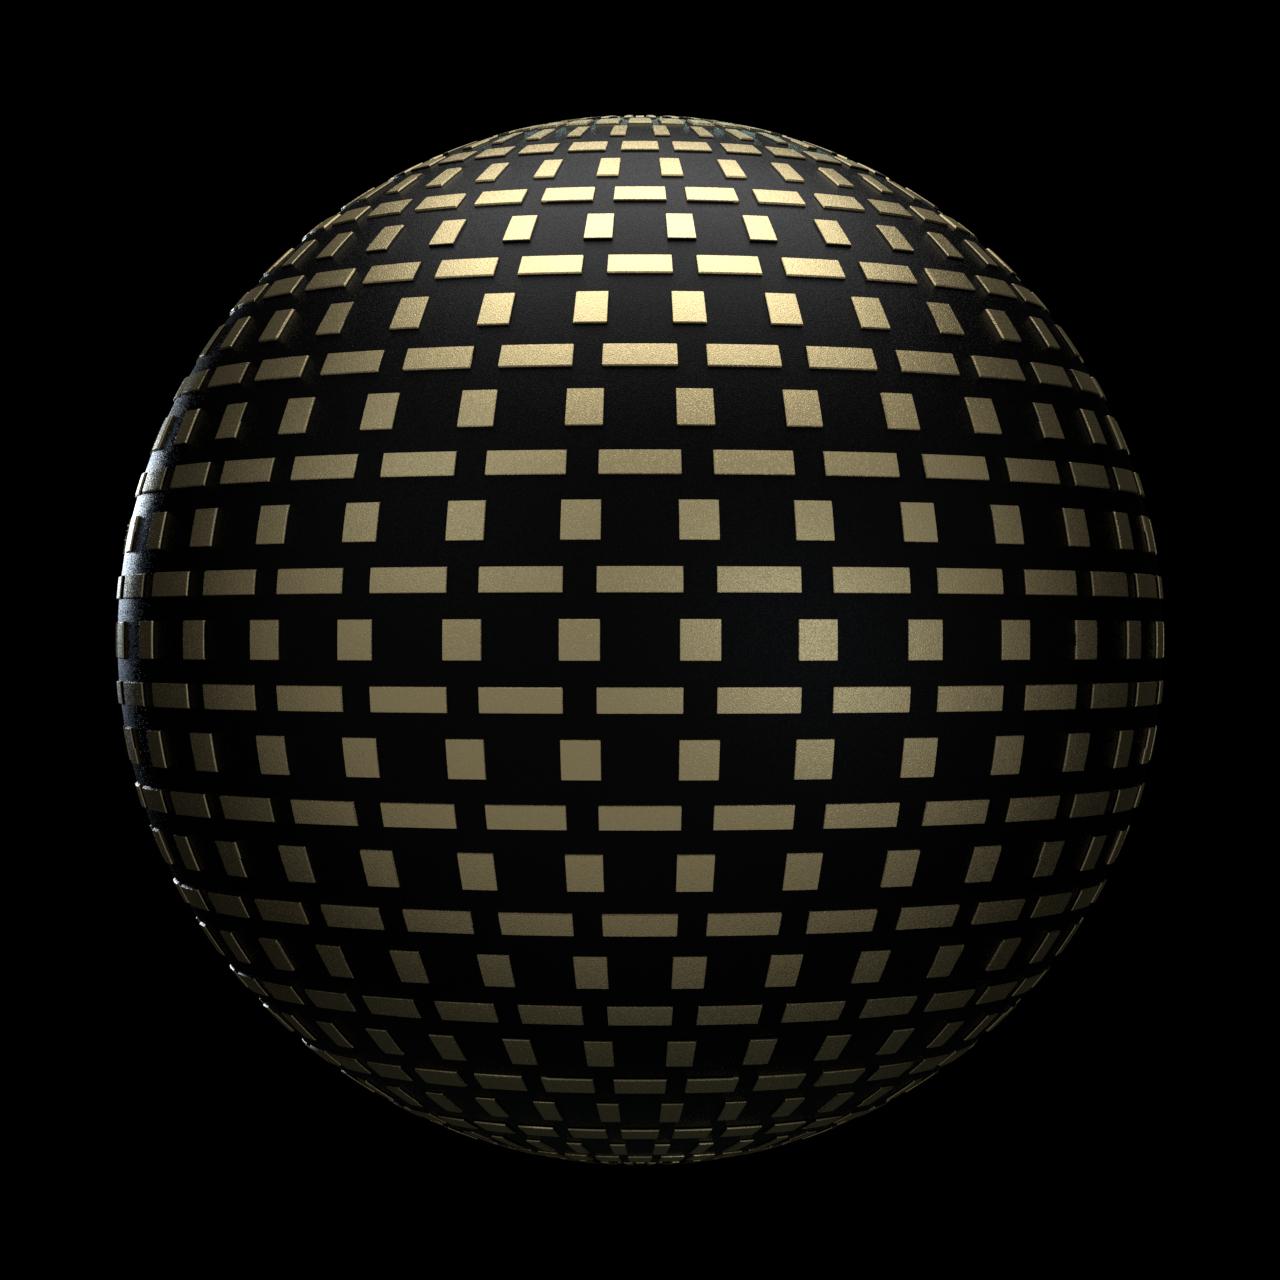 byc_geometric_pack_11_v01.jpg